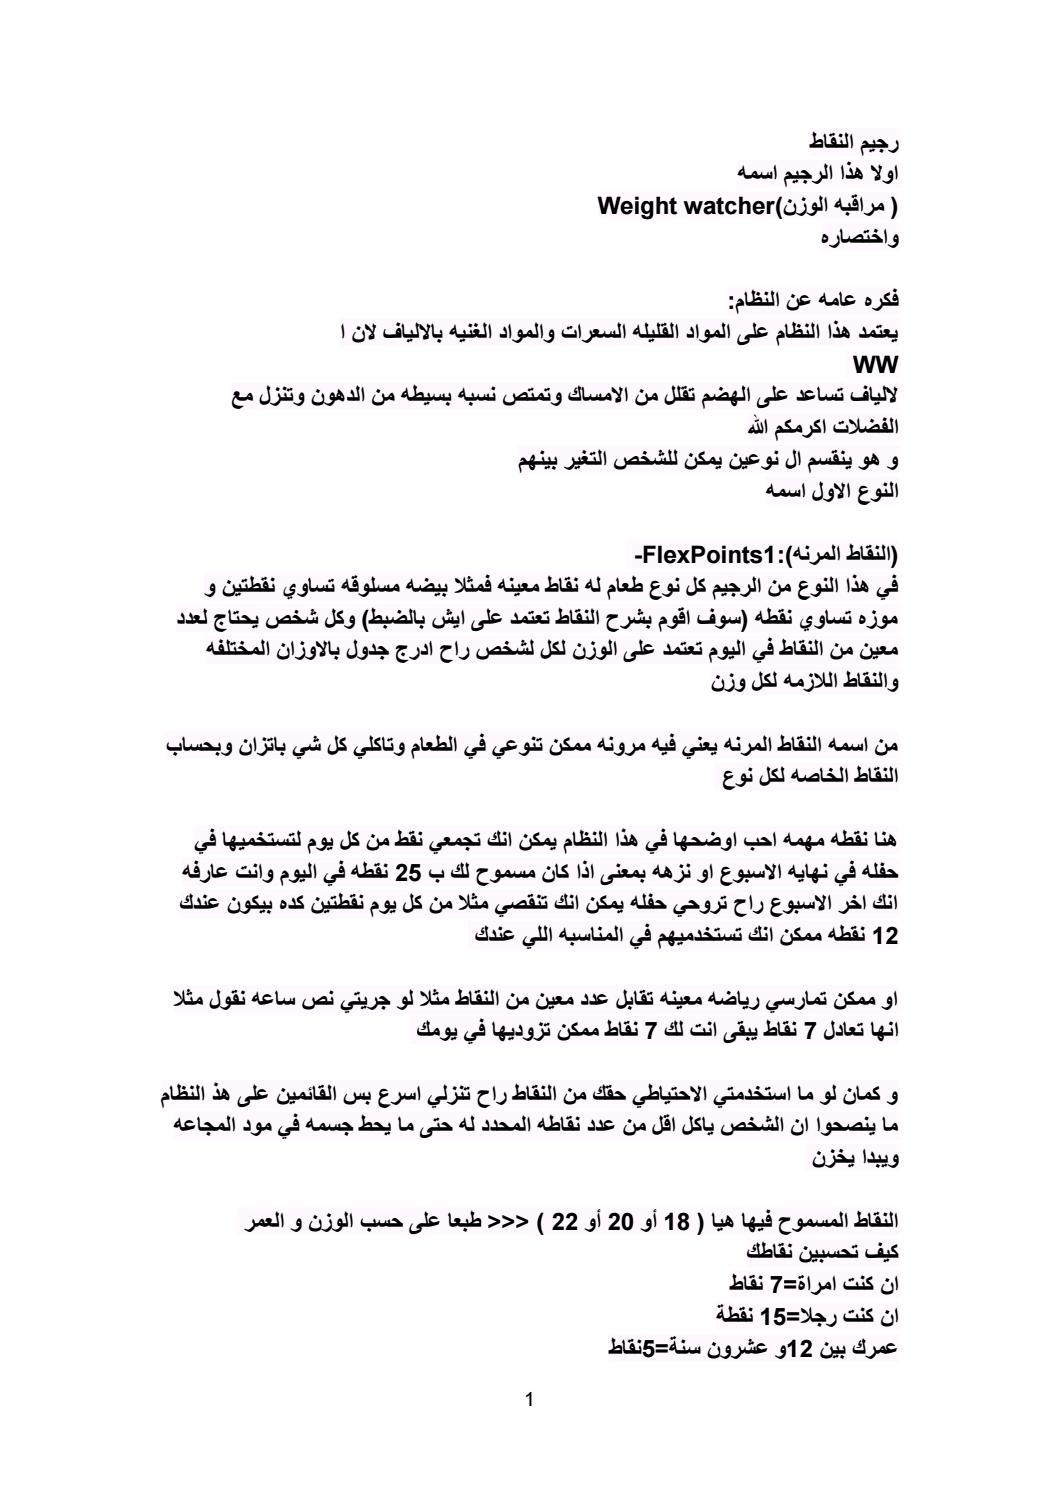 ريجيم النقاط نسخة By Fatima Almhdi Issuu